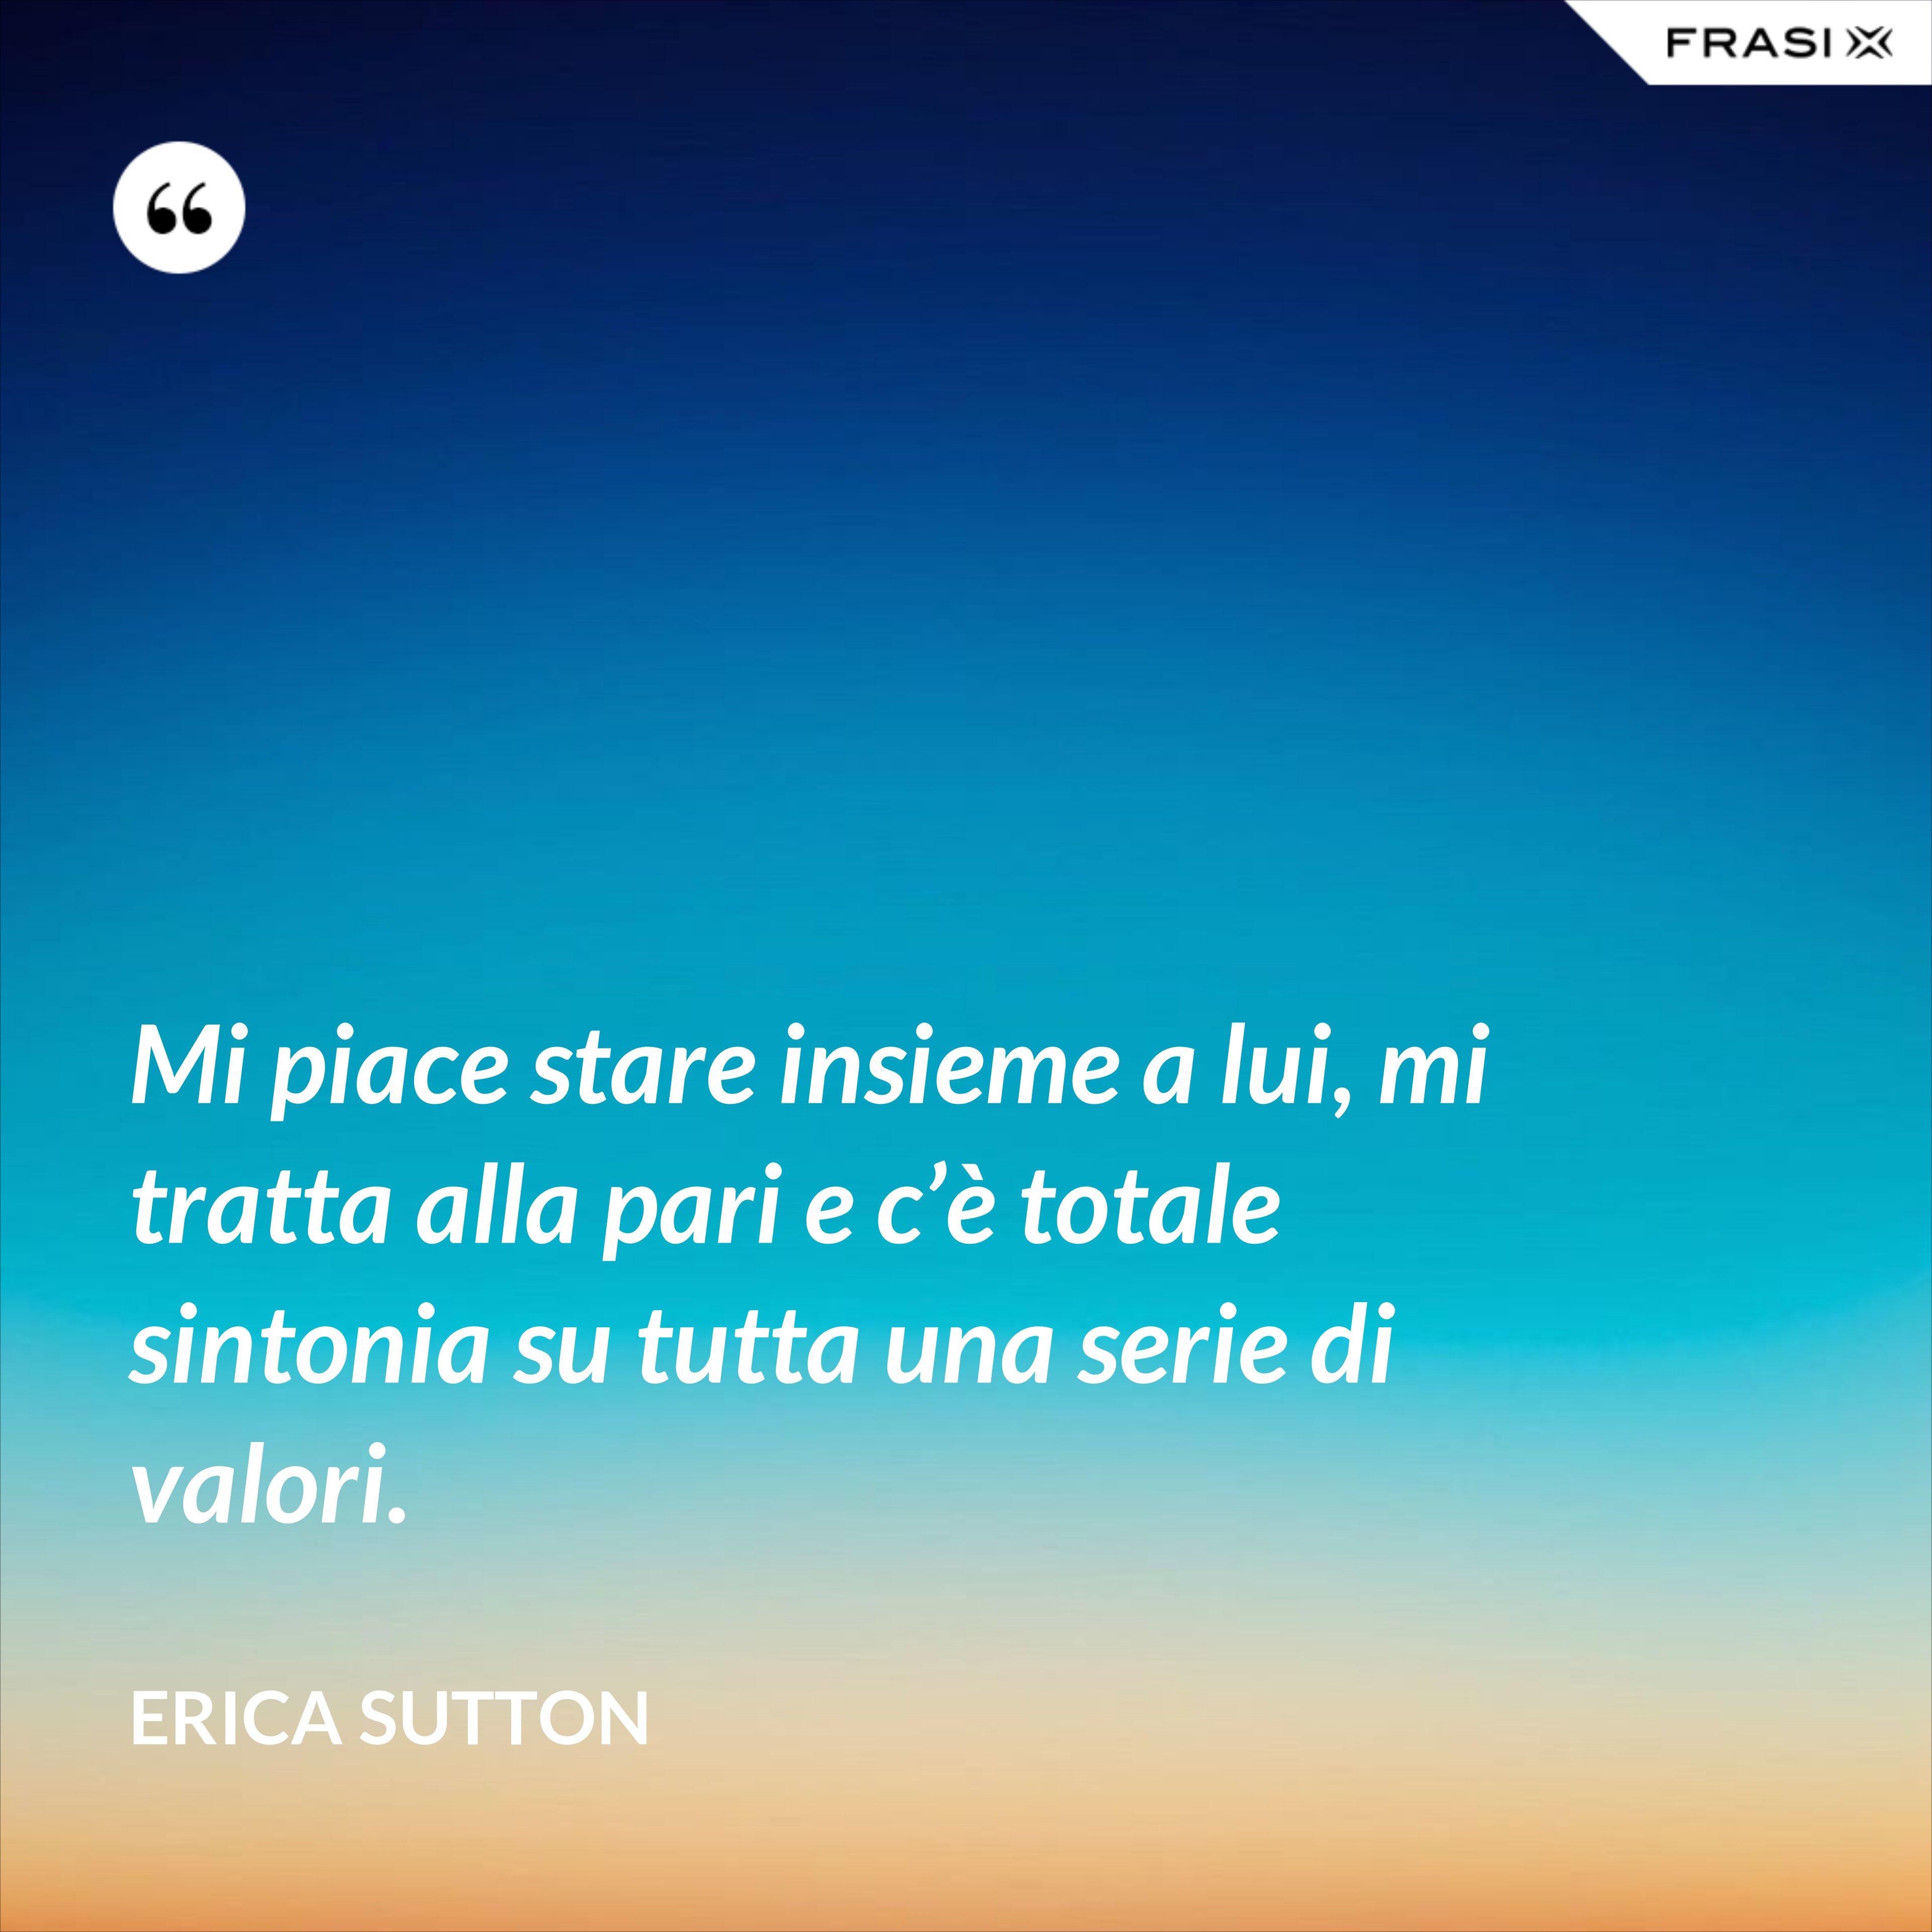 Mi piace stare insieme a lui, mi tratta alla pari e c'è totale sintonia su tutta una serie di valori. - Erica Sutton